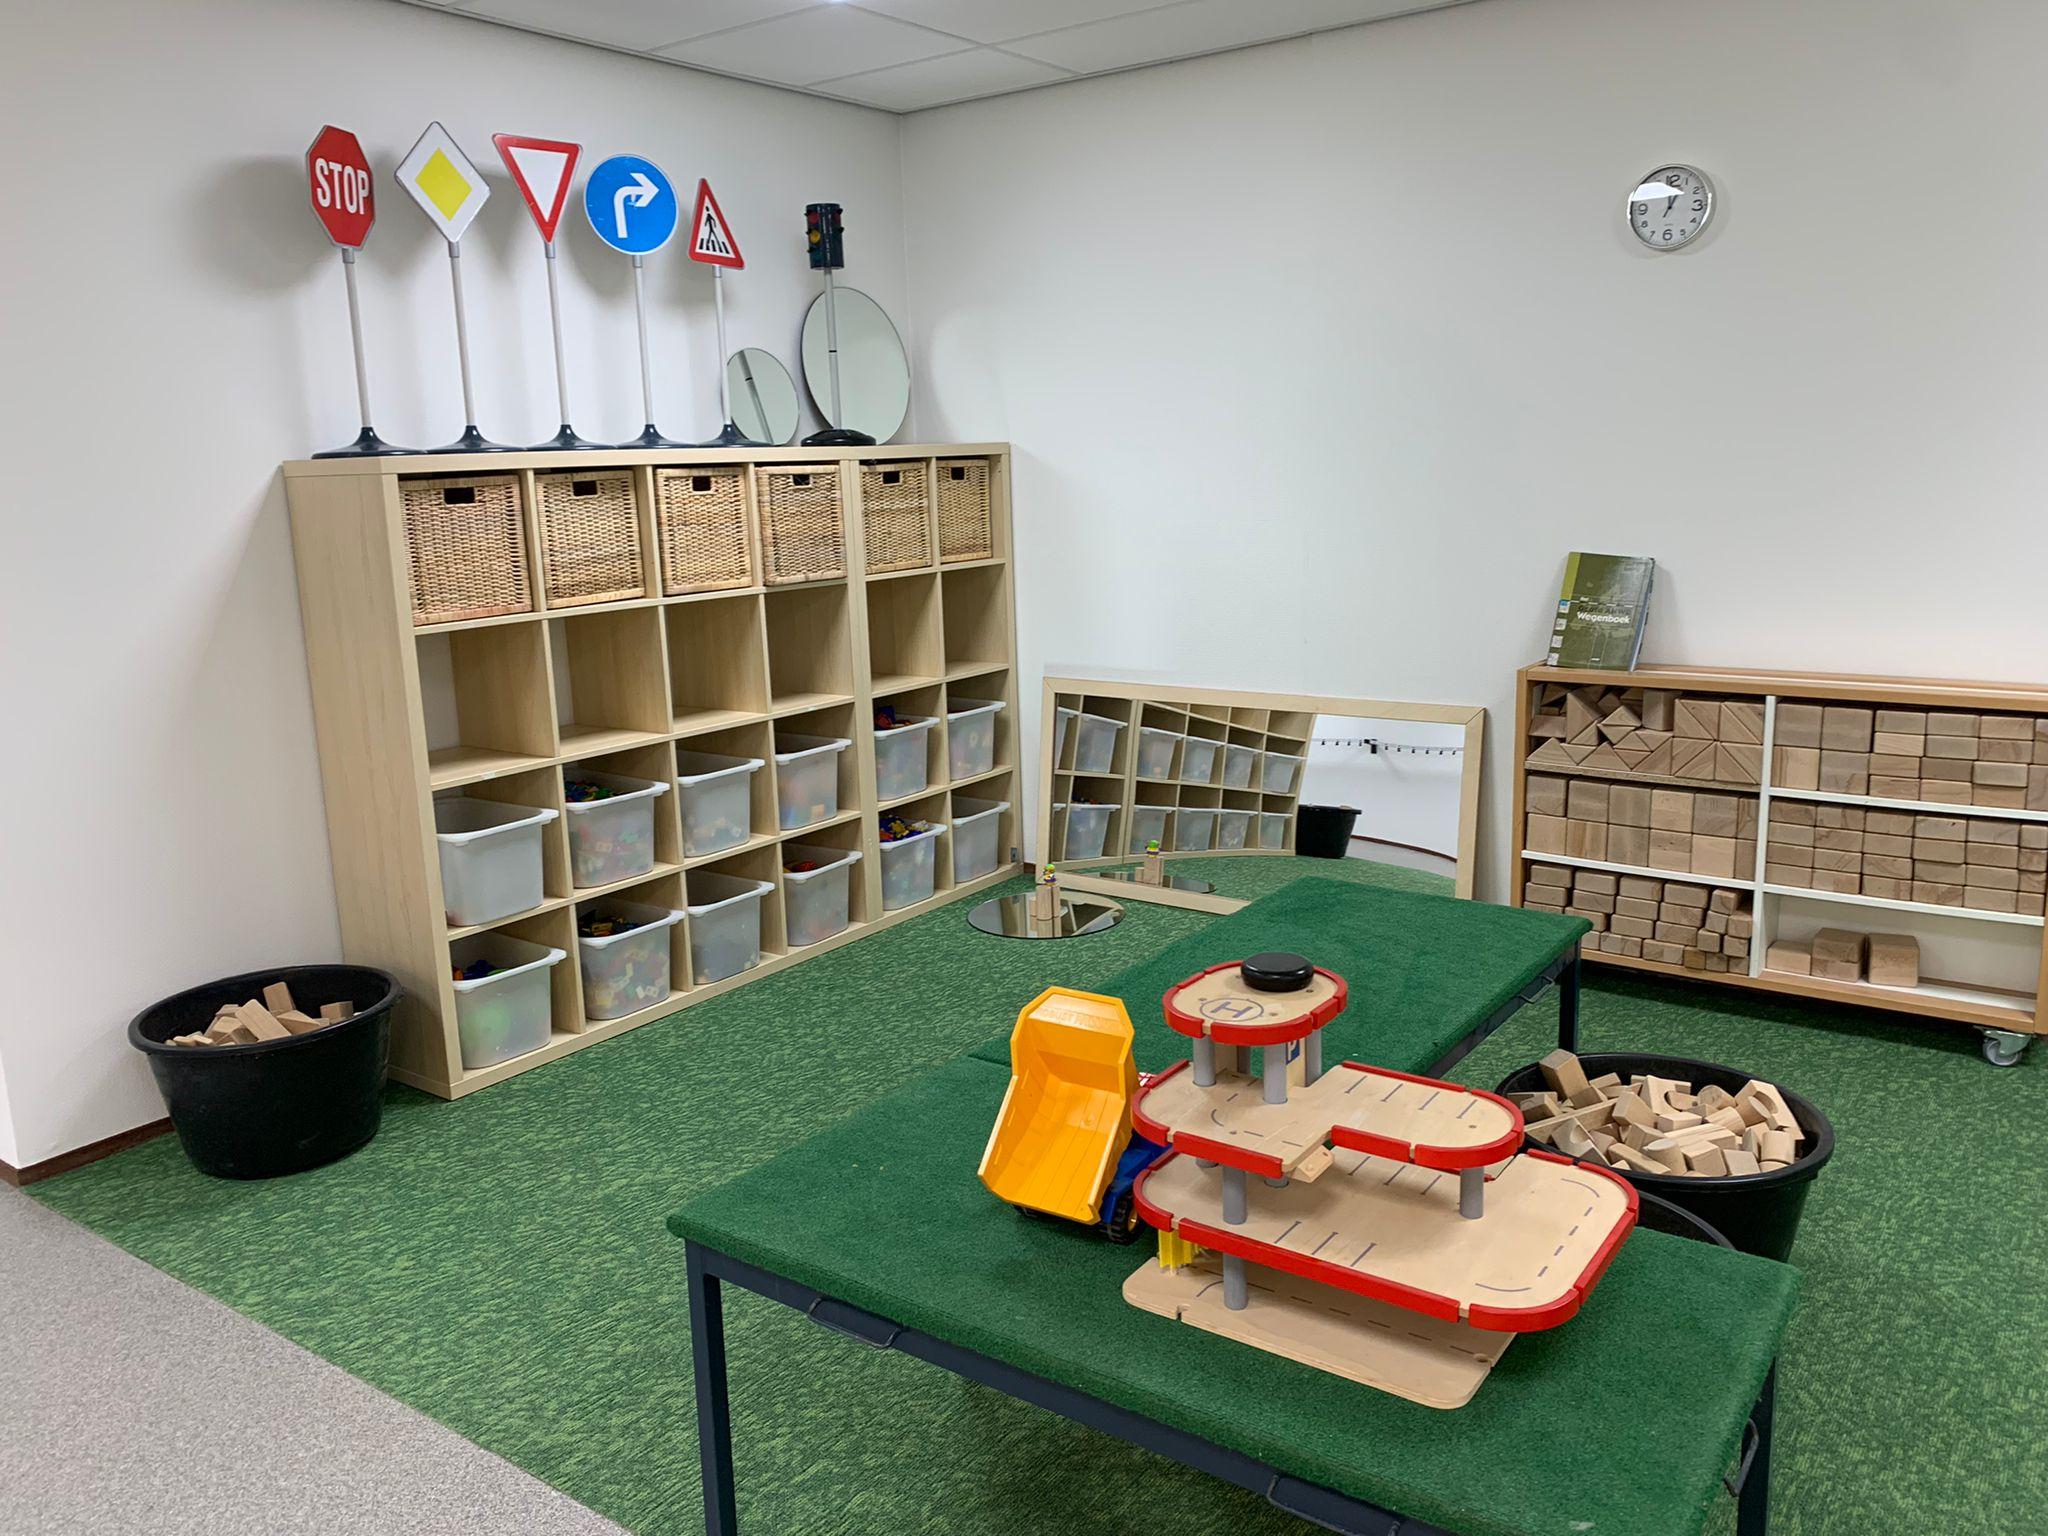 Interieur kindcentrum De Vlonder